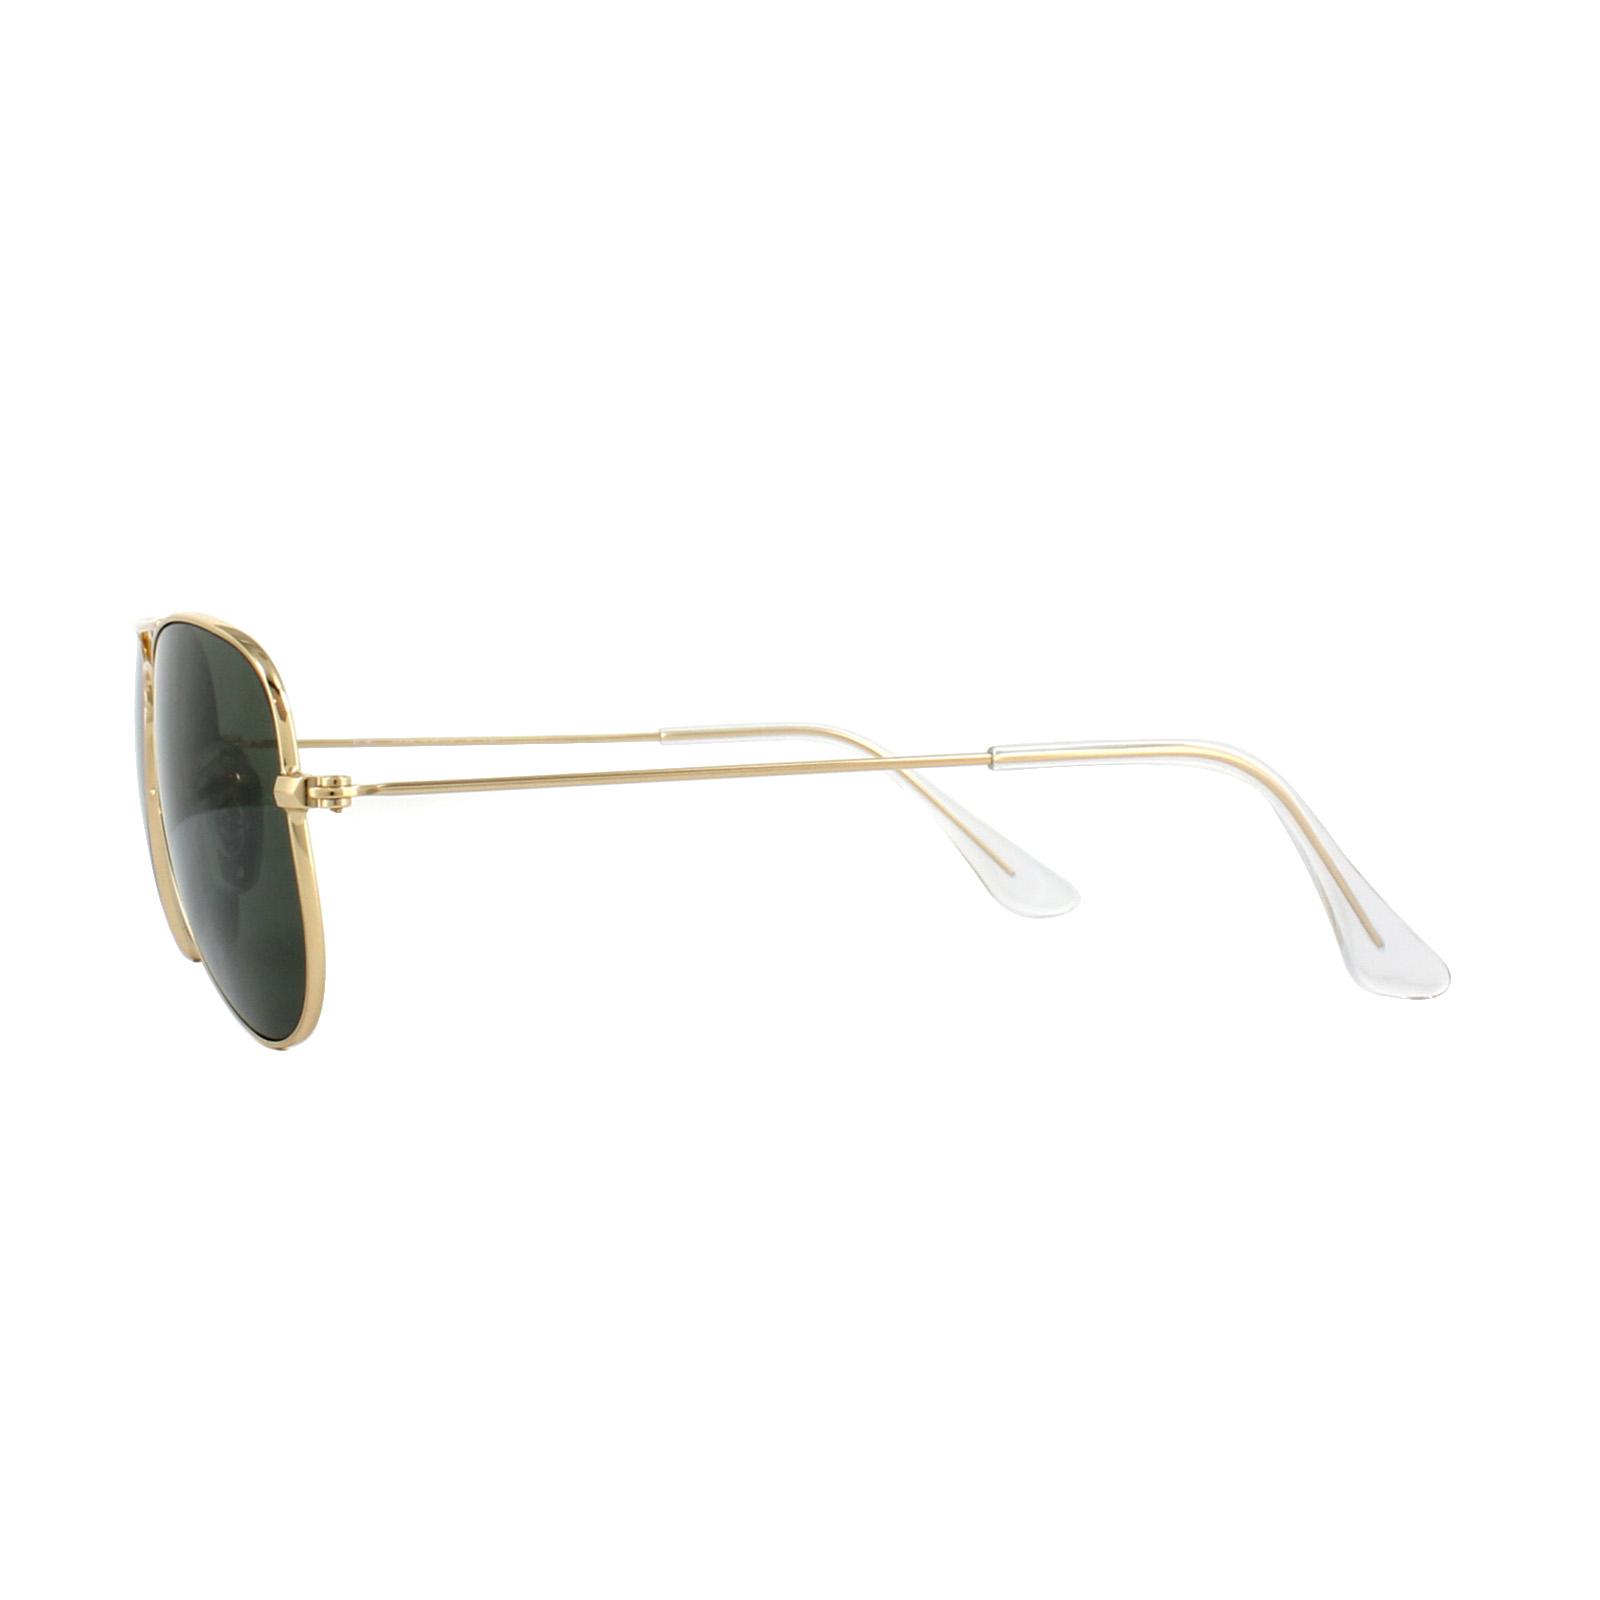 159ada8f7 ... wholesale sentinel ray ban sunglasses small aviator 3044 l0207 gold  green b729a fee5f